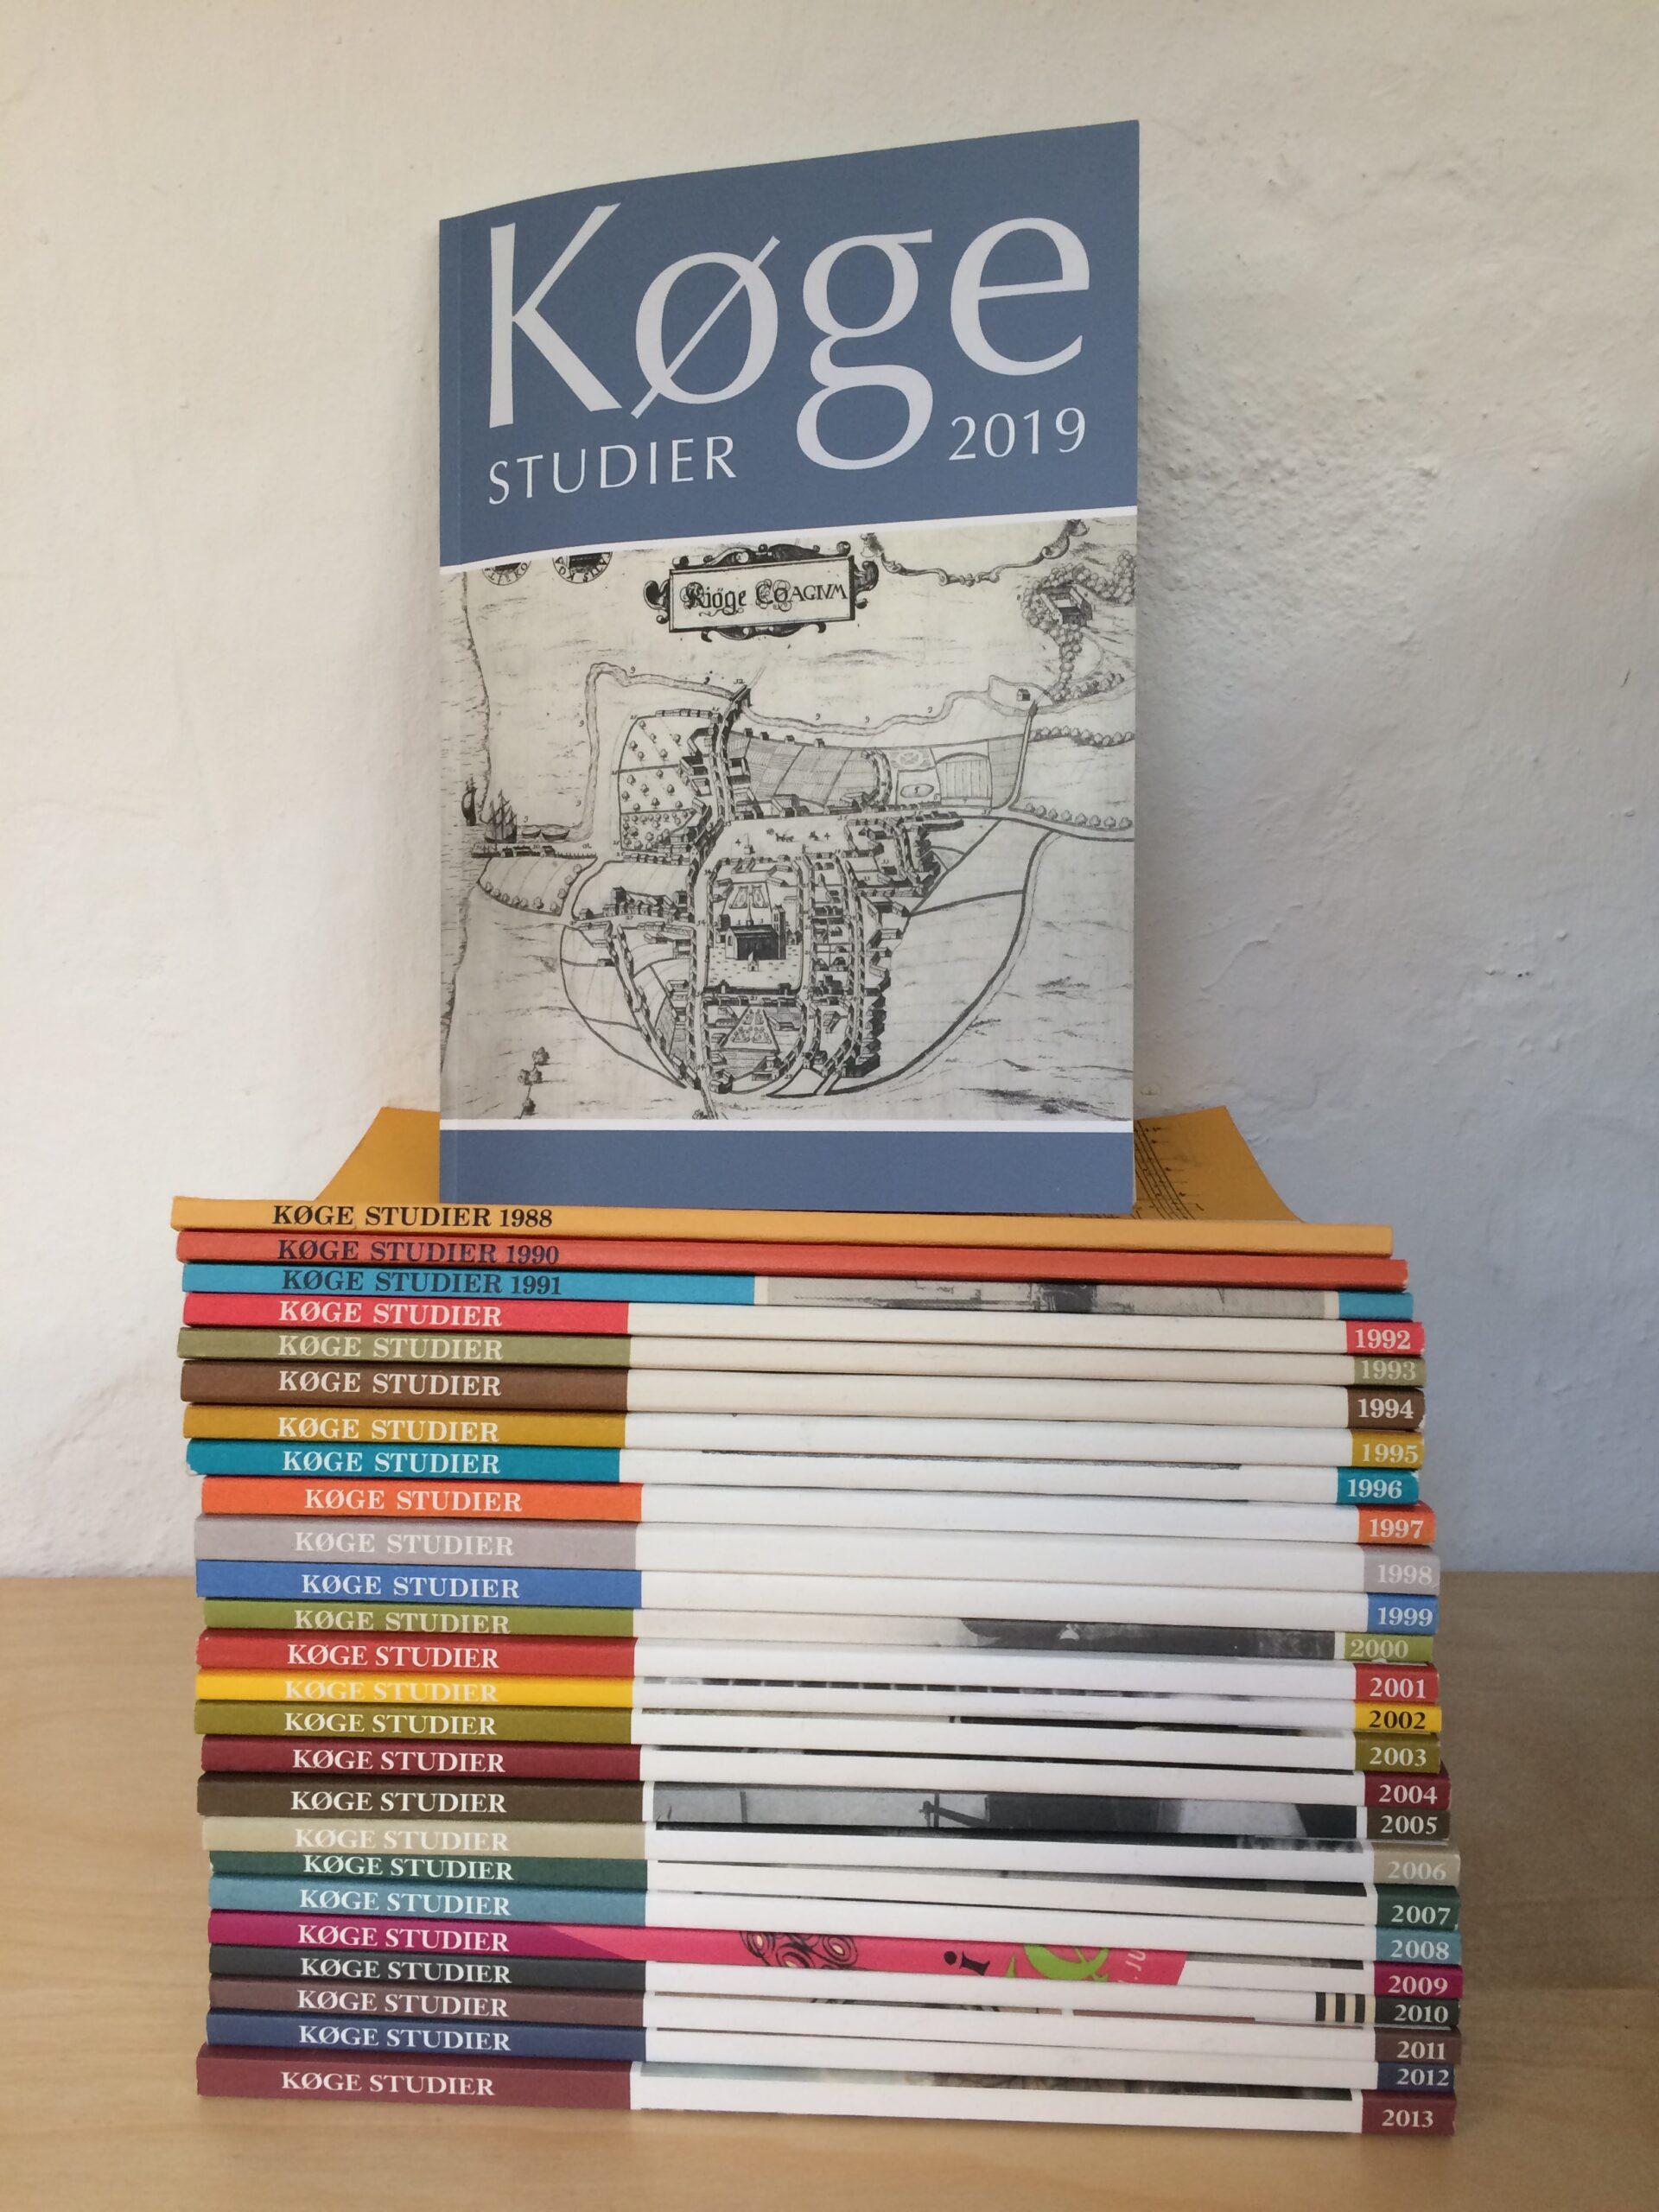 Køge Studier 2019